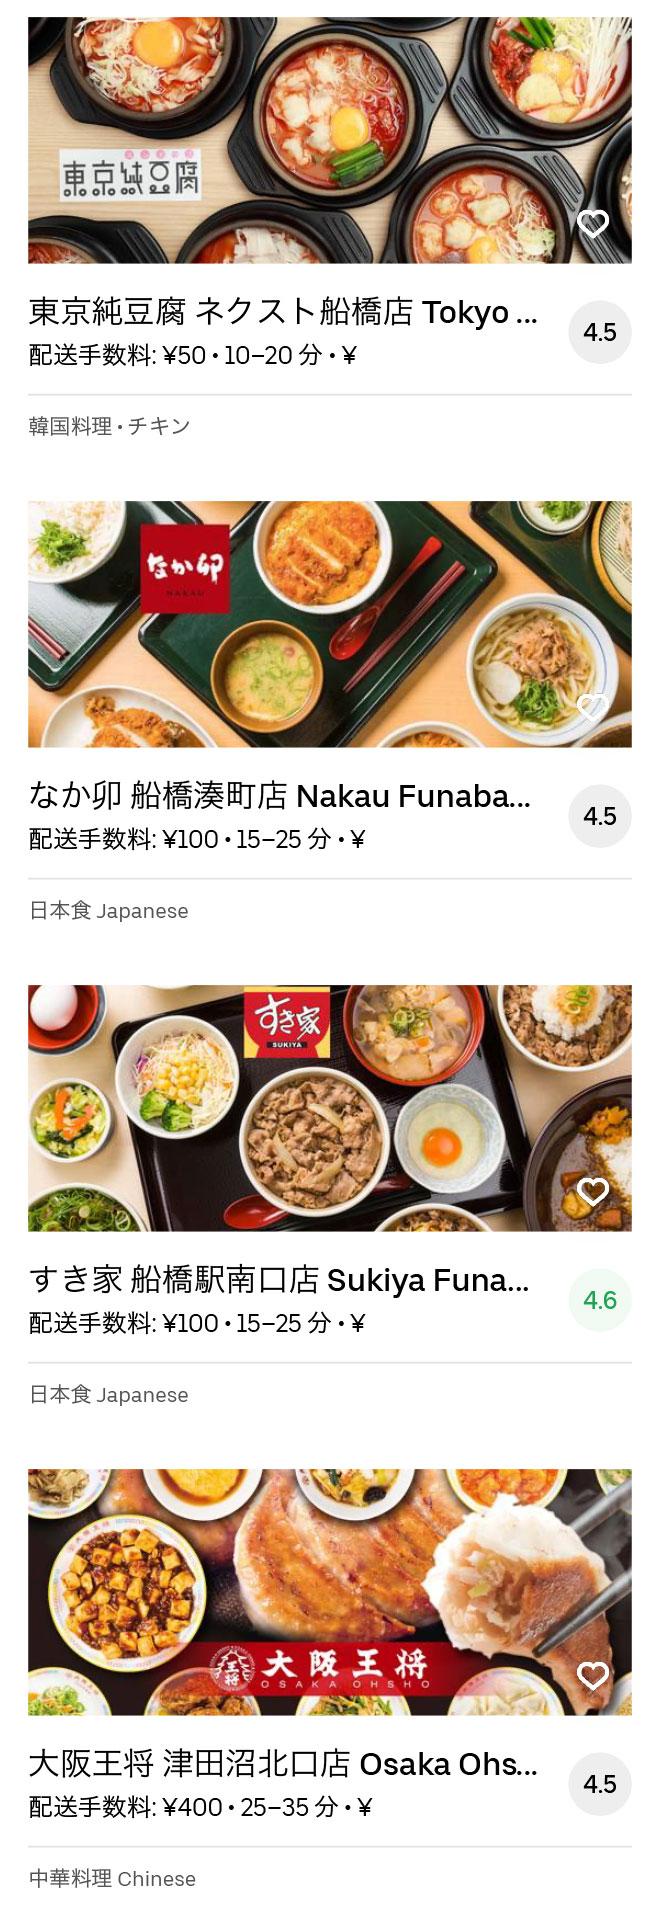 Funabashi menu 2004 06